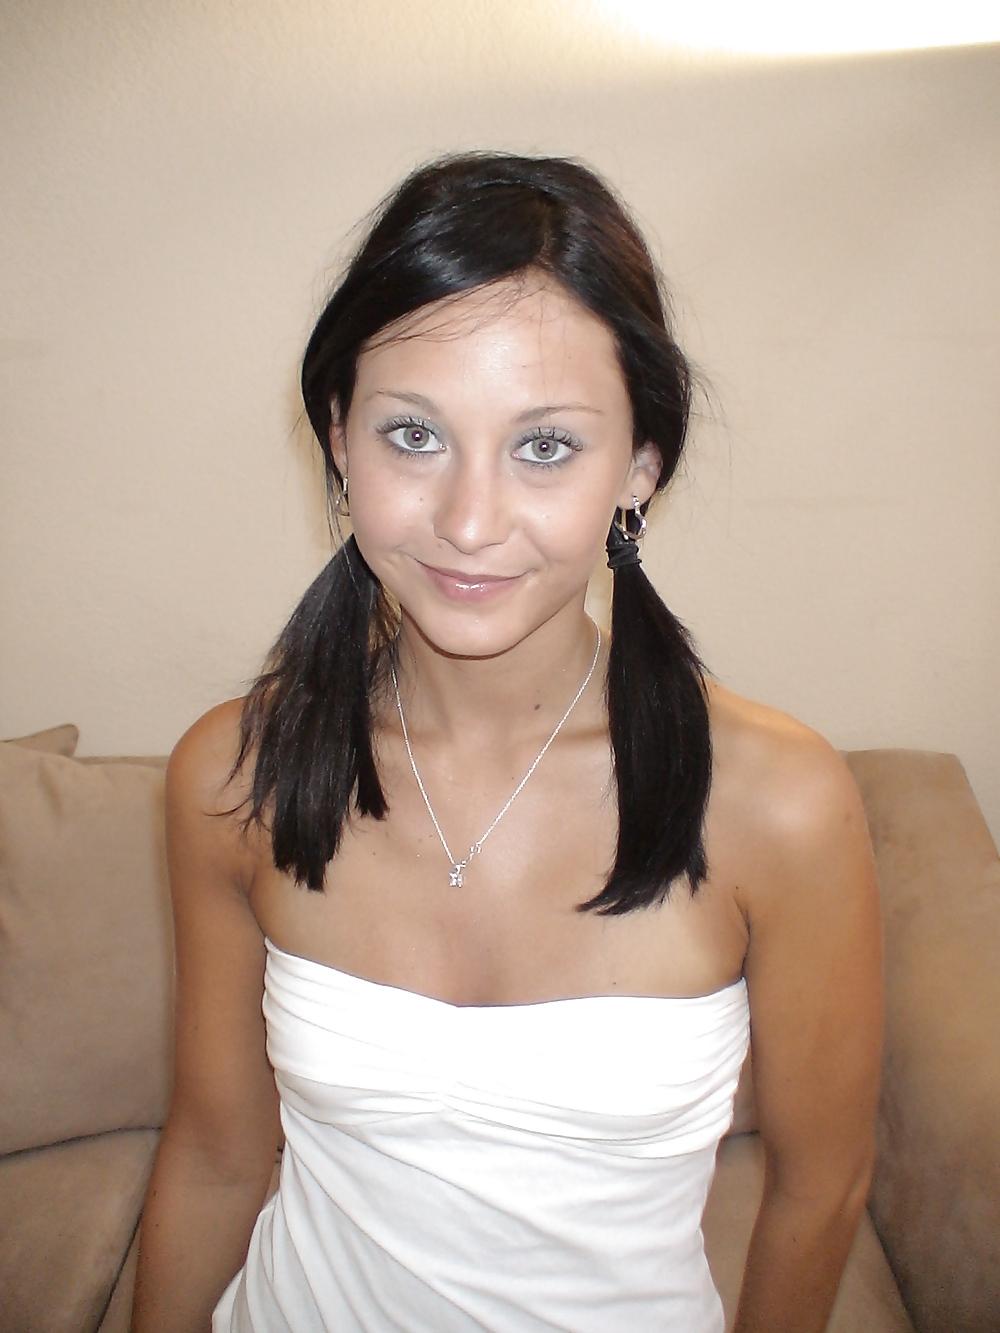 Cute Amateur Brunette Teen